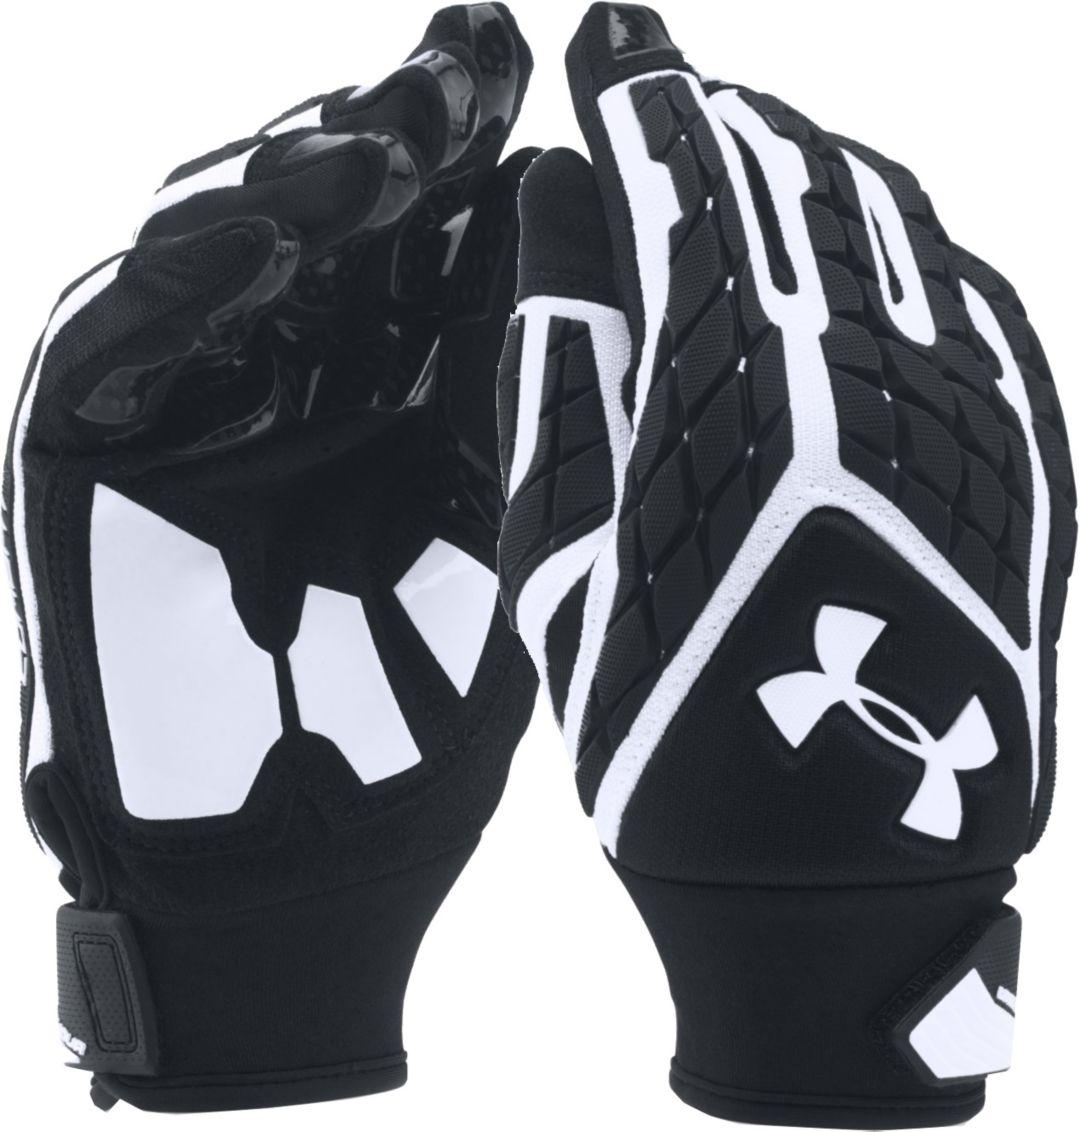 269b3bb8b1 Under Armour Youth Combat Full Finger Lineman Gloves. noImageFound. 1